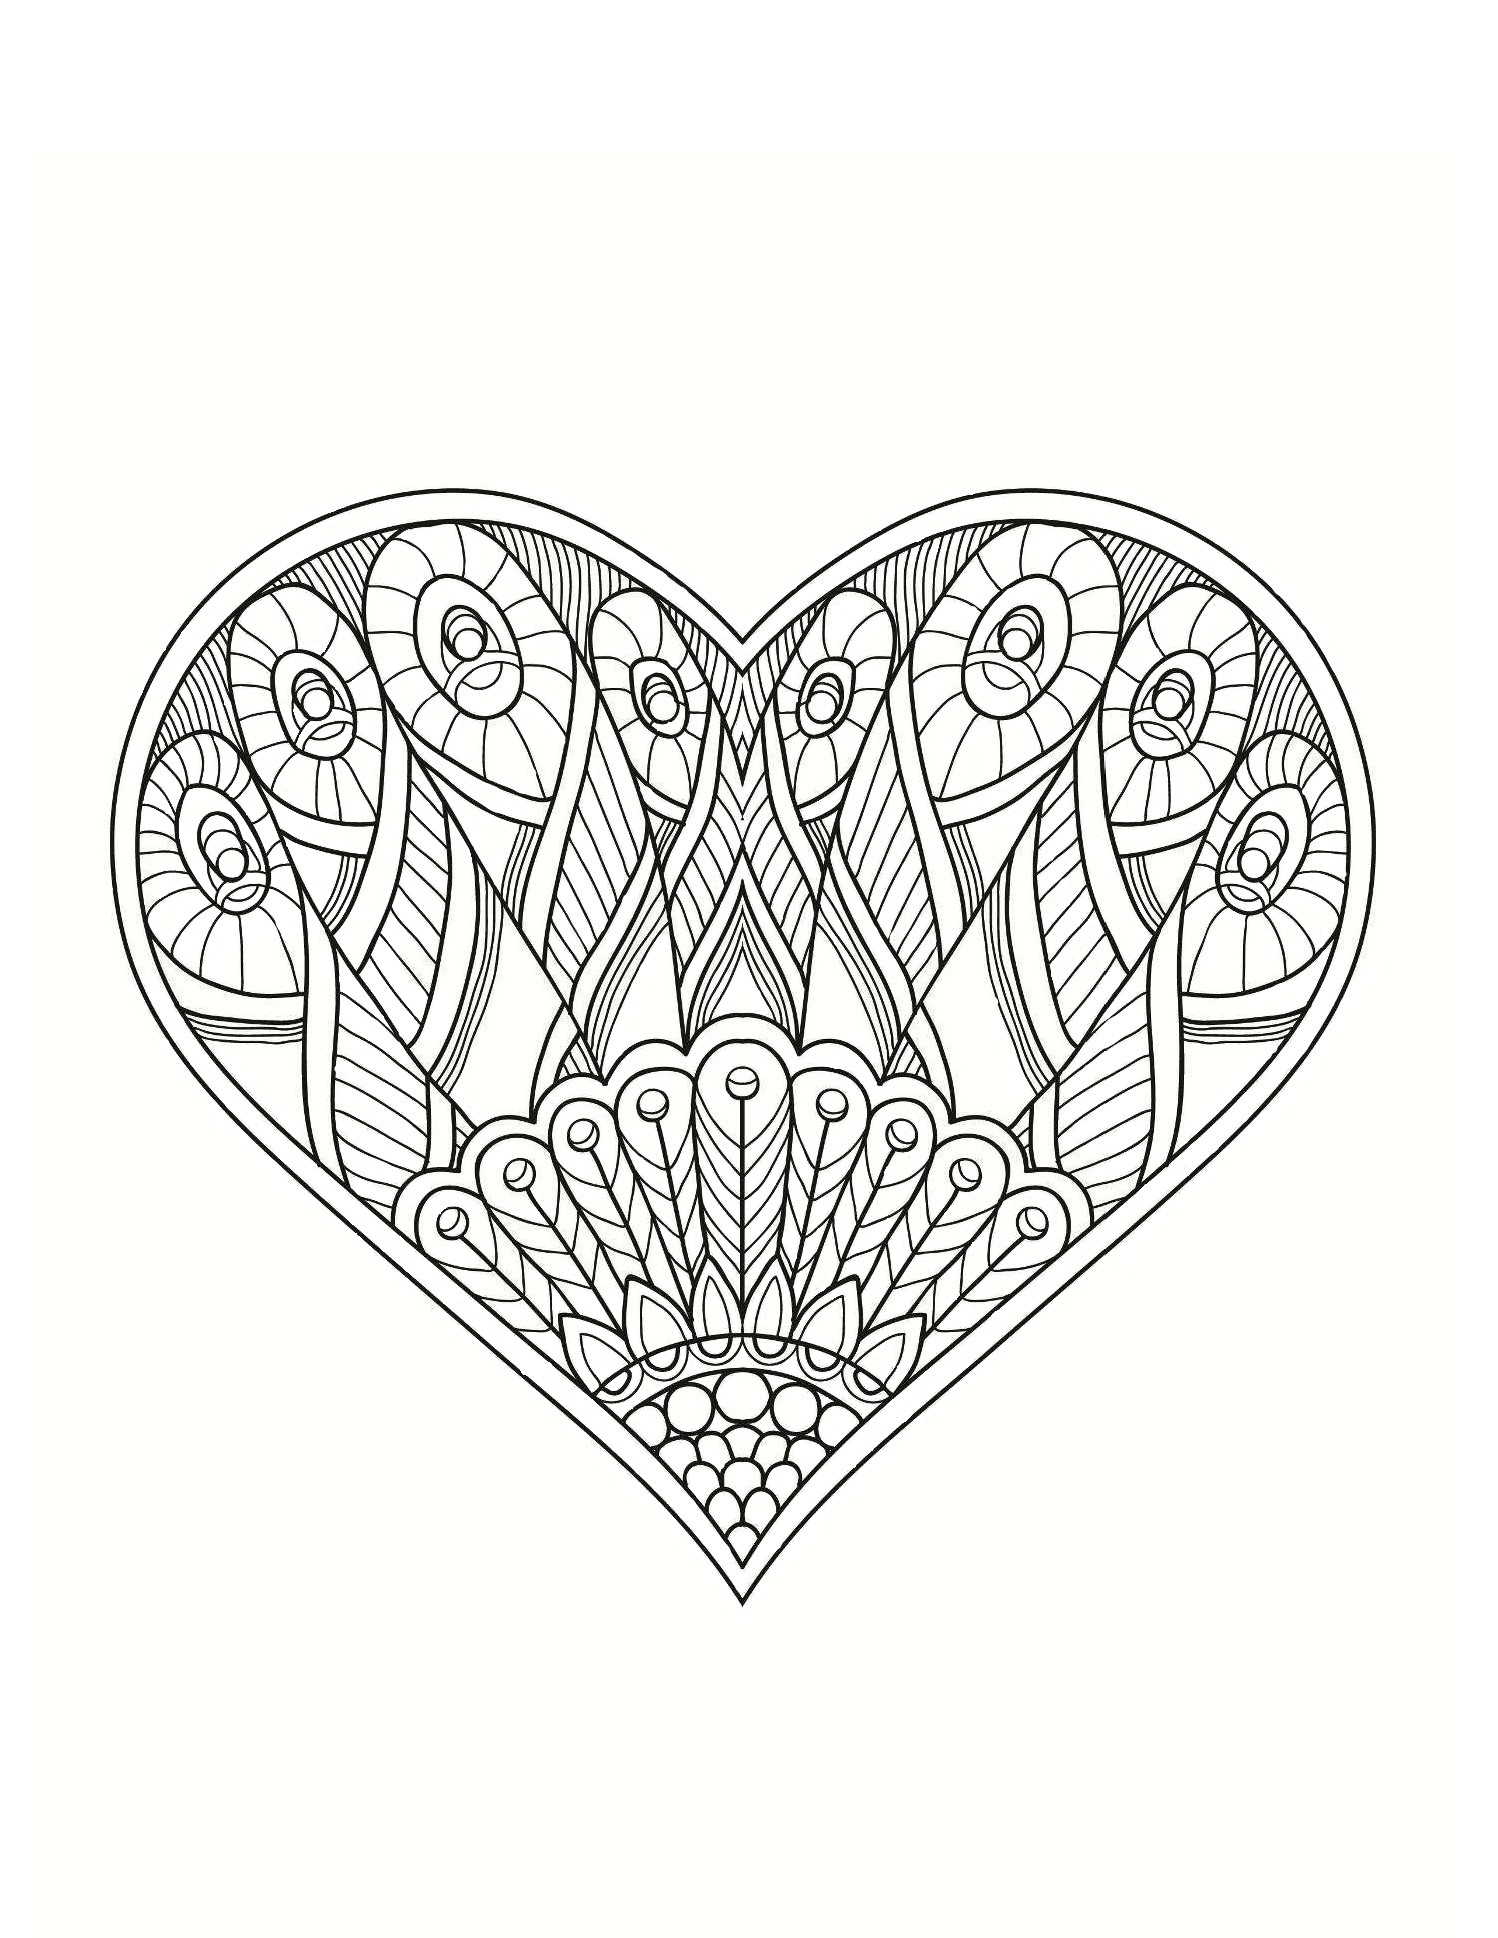 сердце с рисунком сердца раскраски антистресс